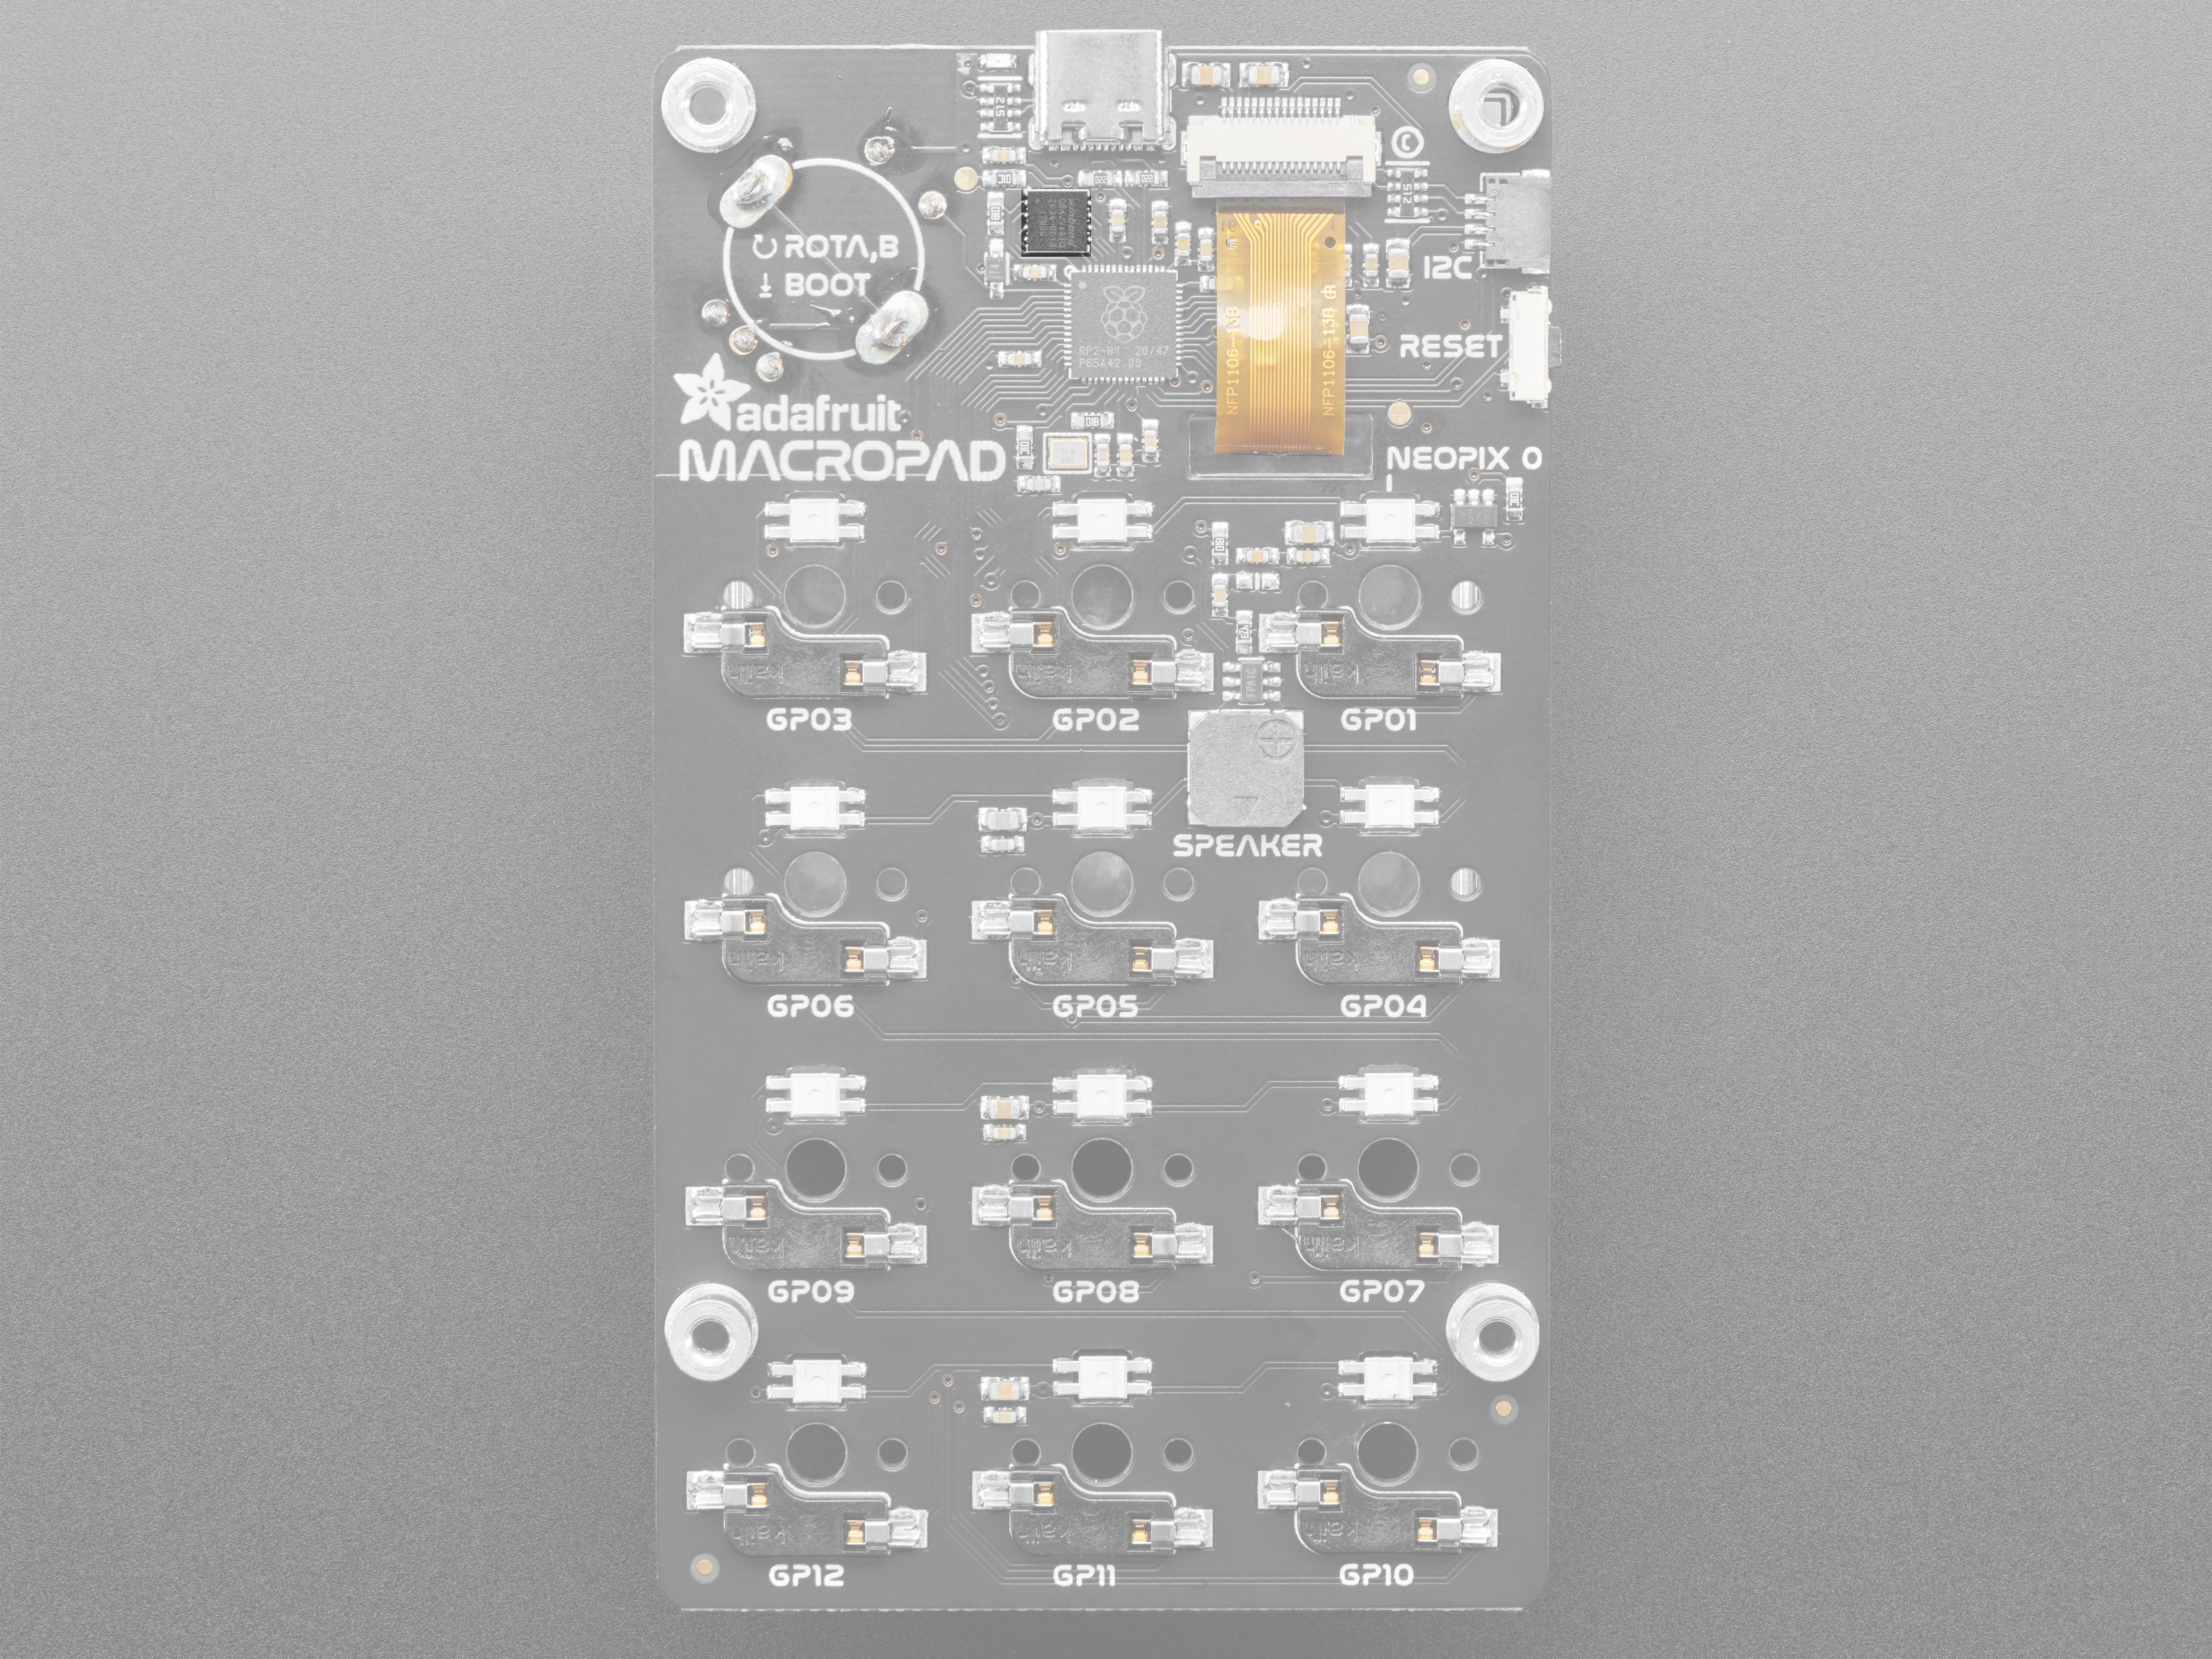 adafruit_products_MacroPad_pinouts_QSPI_flash.jpg